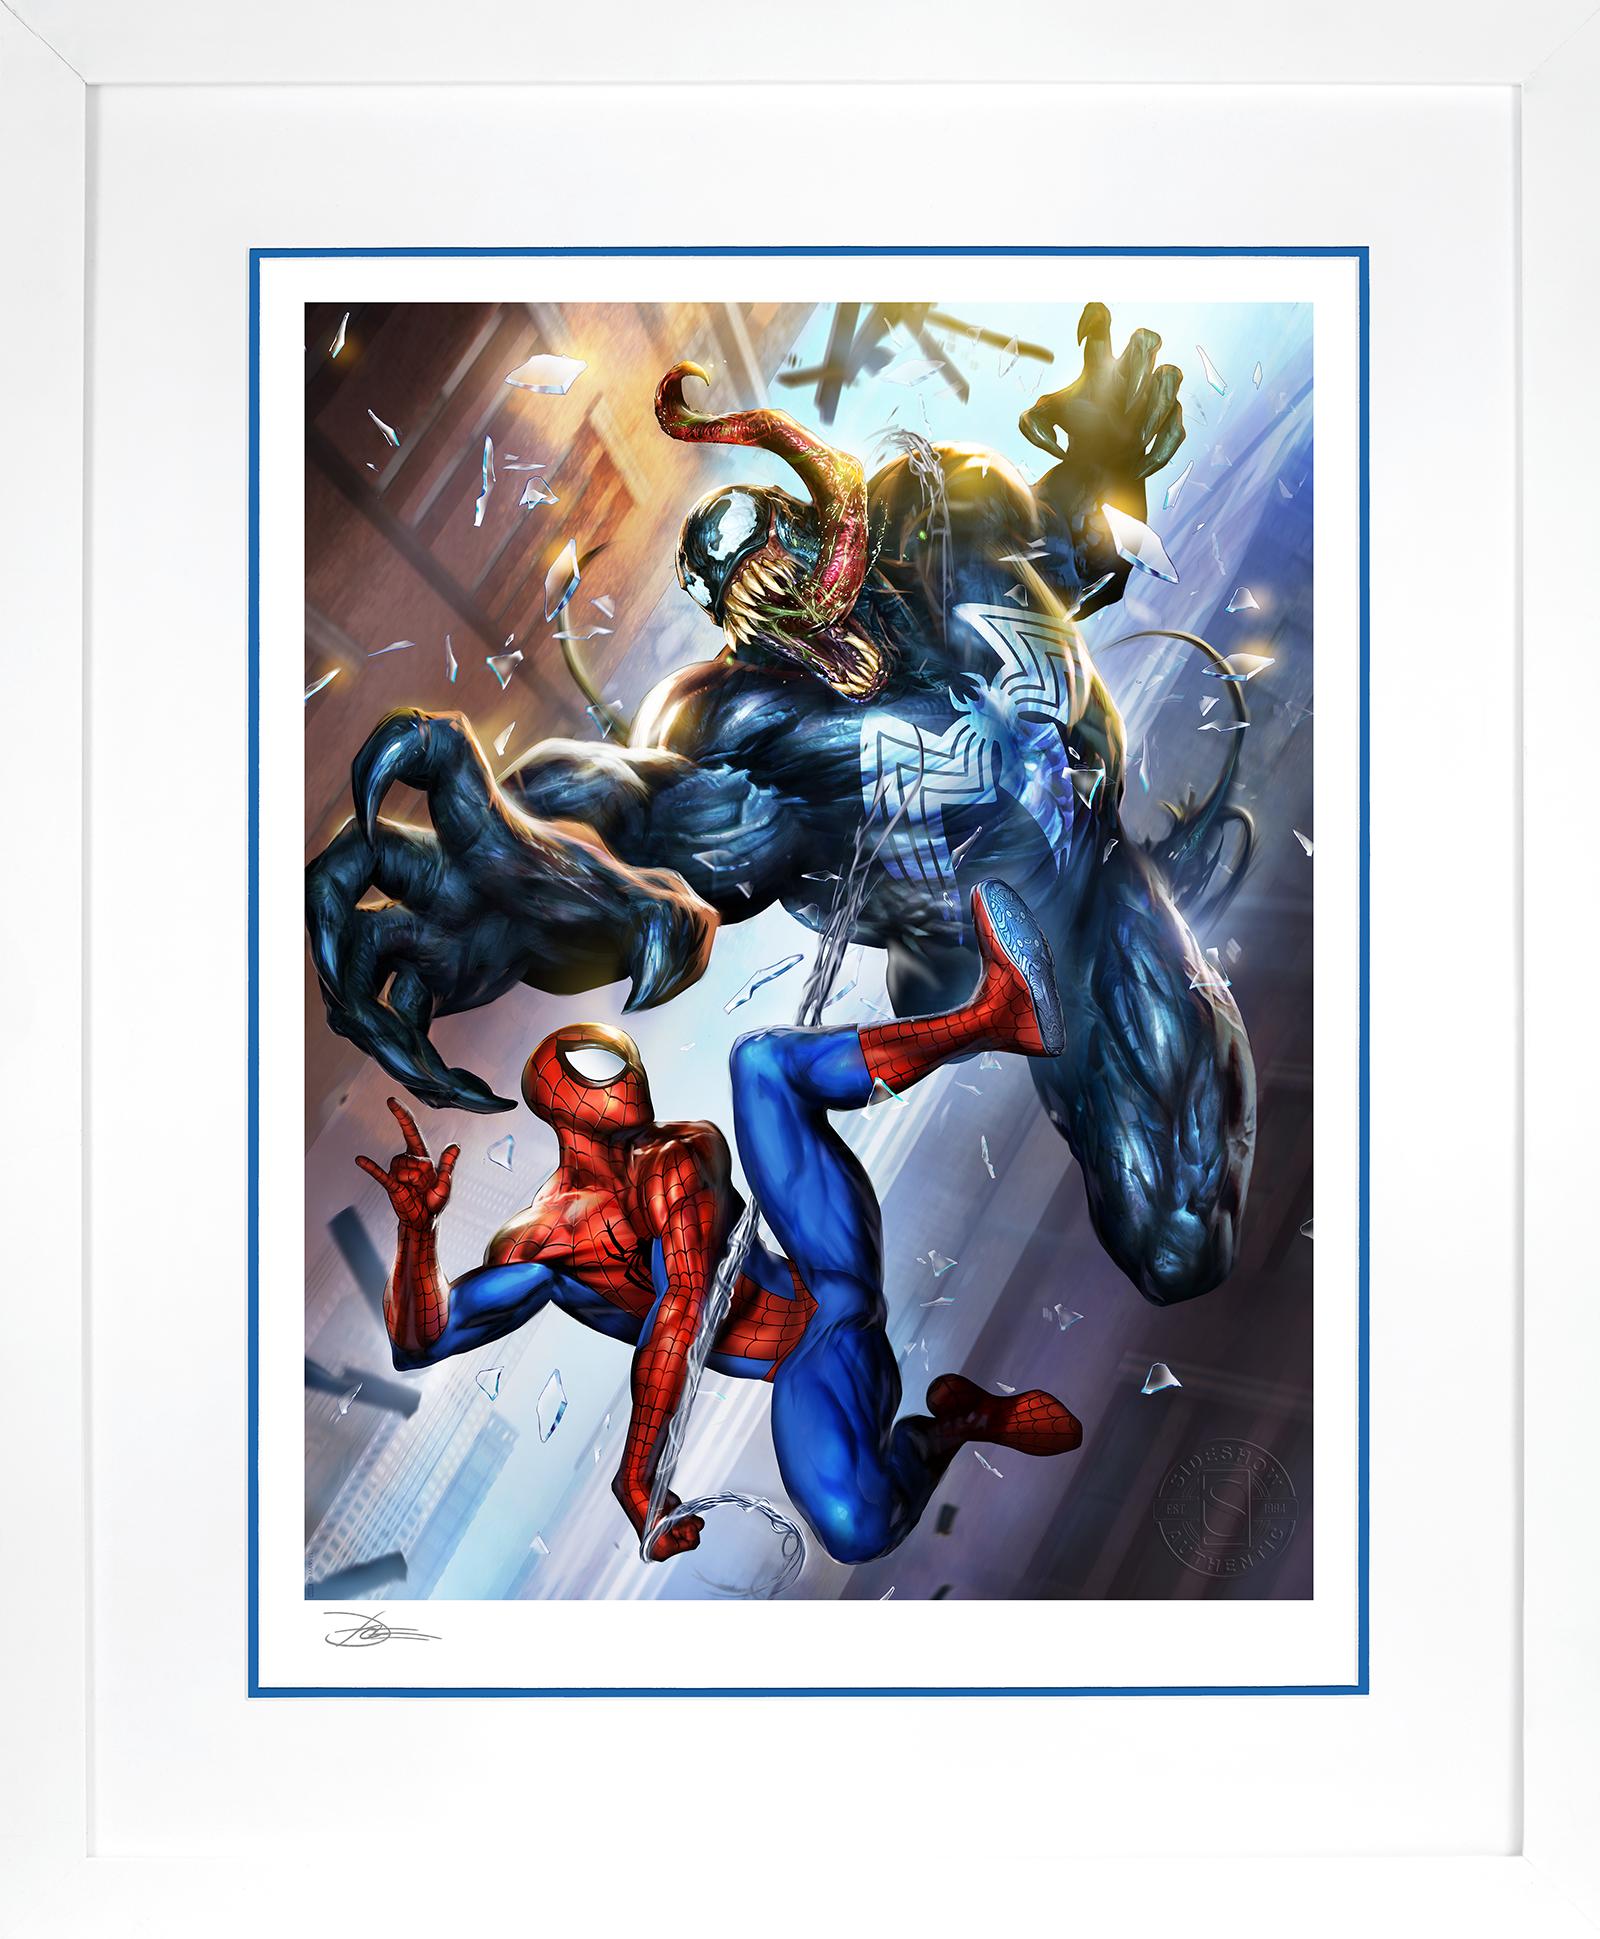 Sideshow Collectibles Spider-Man vs Venom Art Print